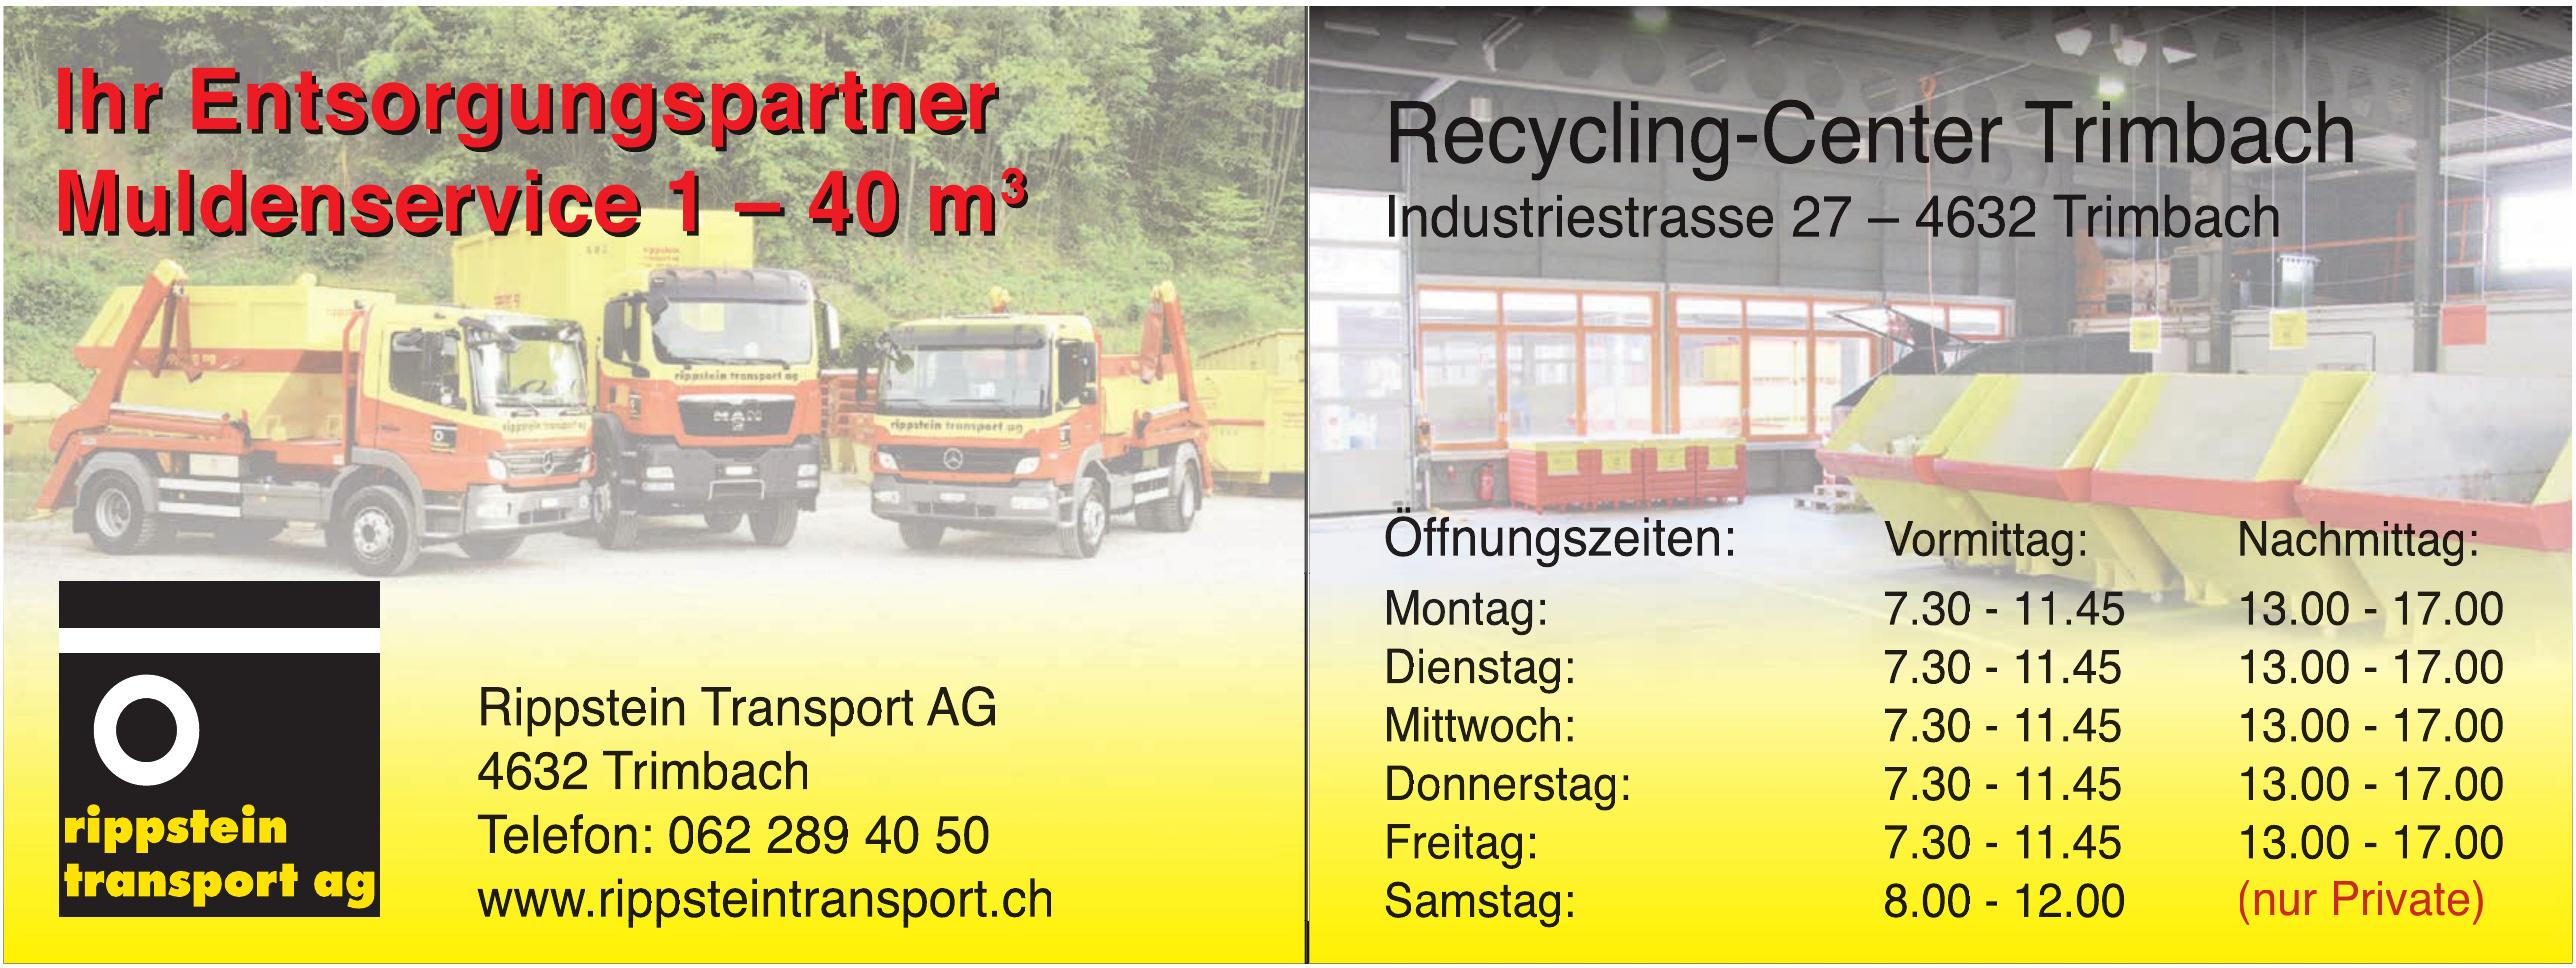 Ripstein Transport AG